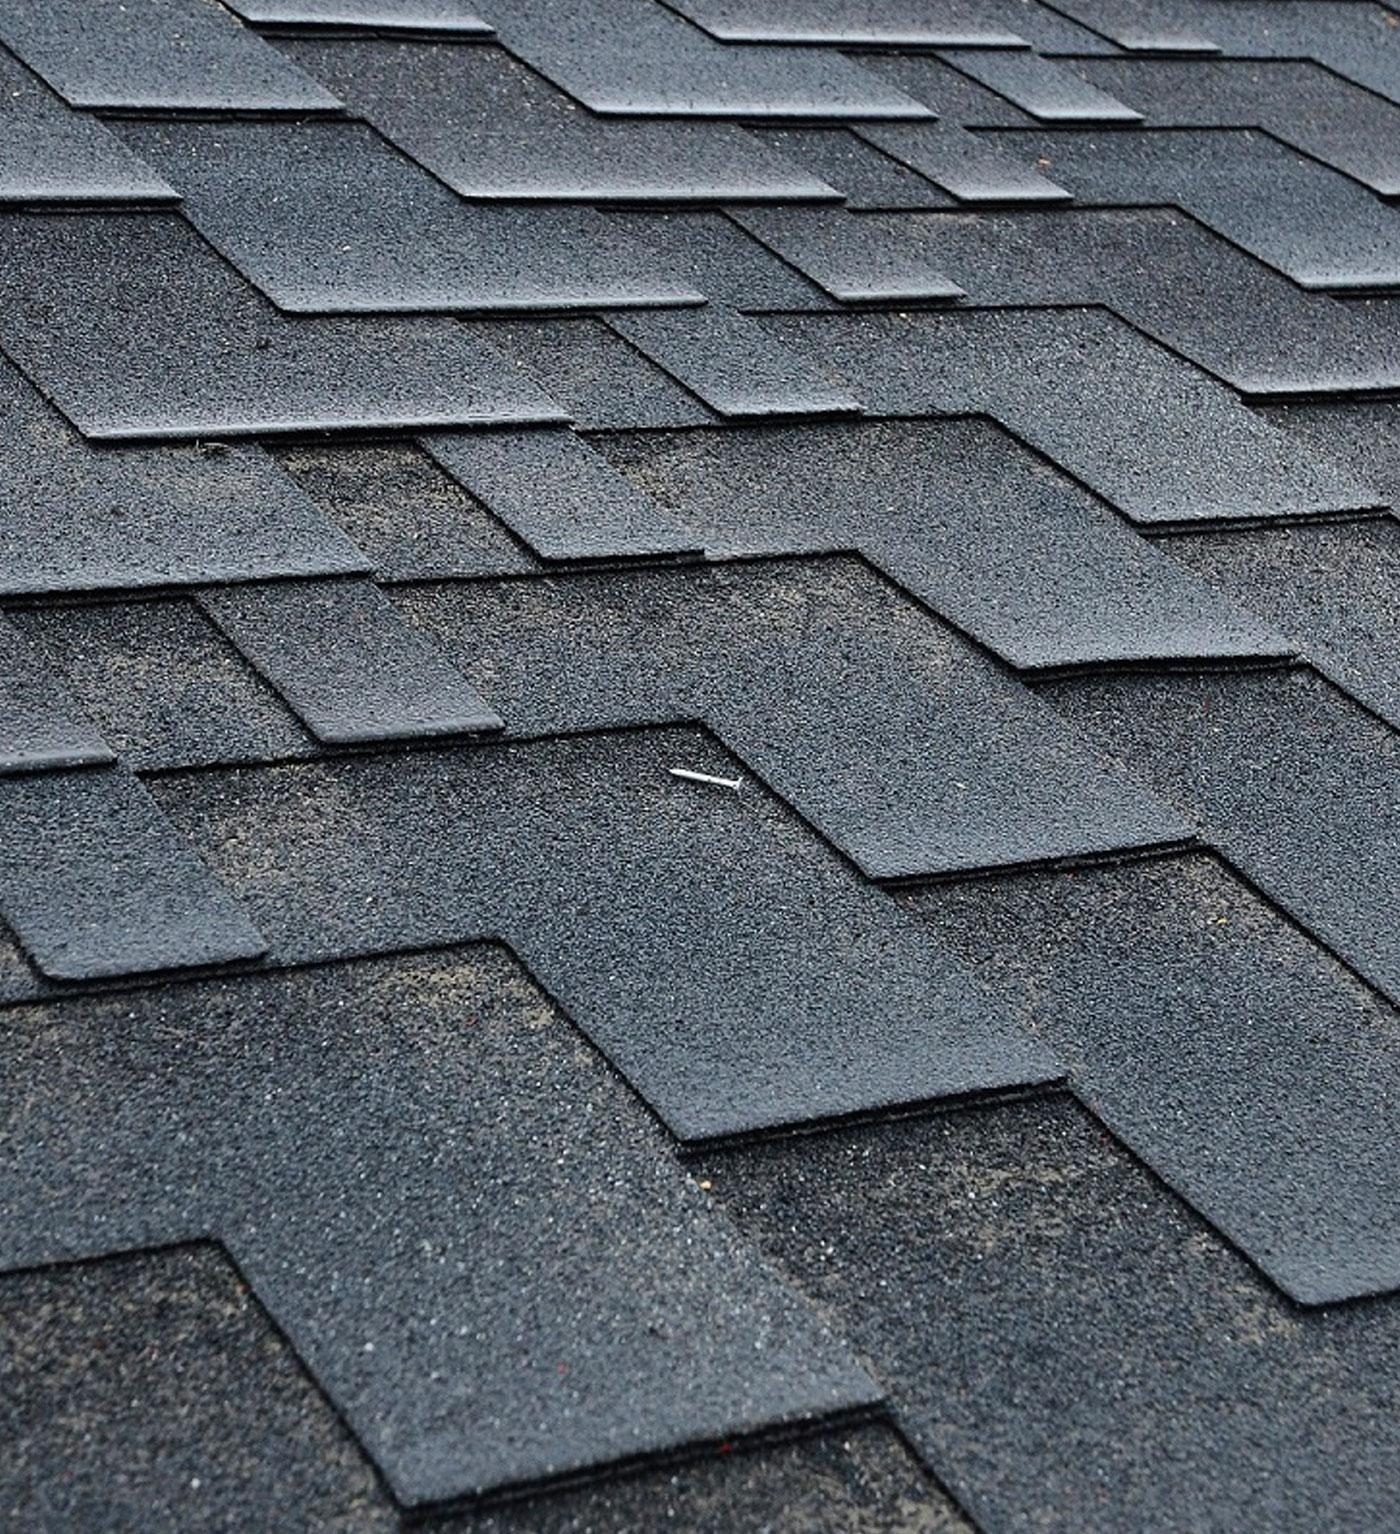 building-shingles-roofing-lumber-supply-store-eureka-ca-humboldt-county-california